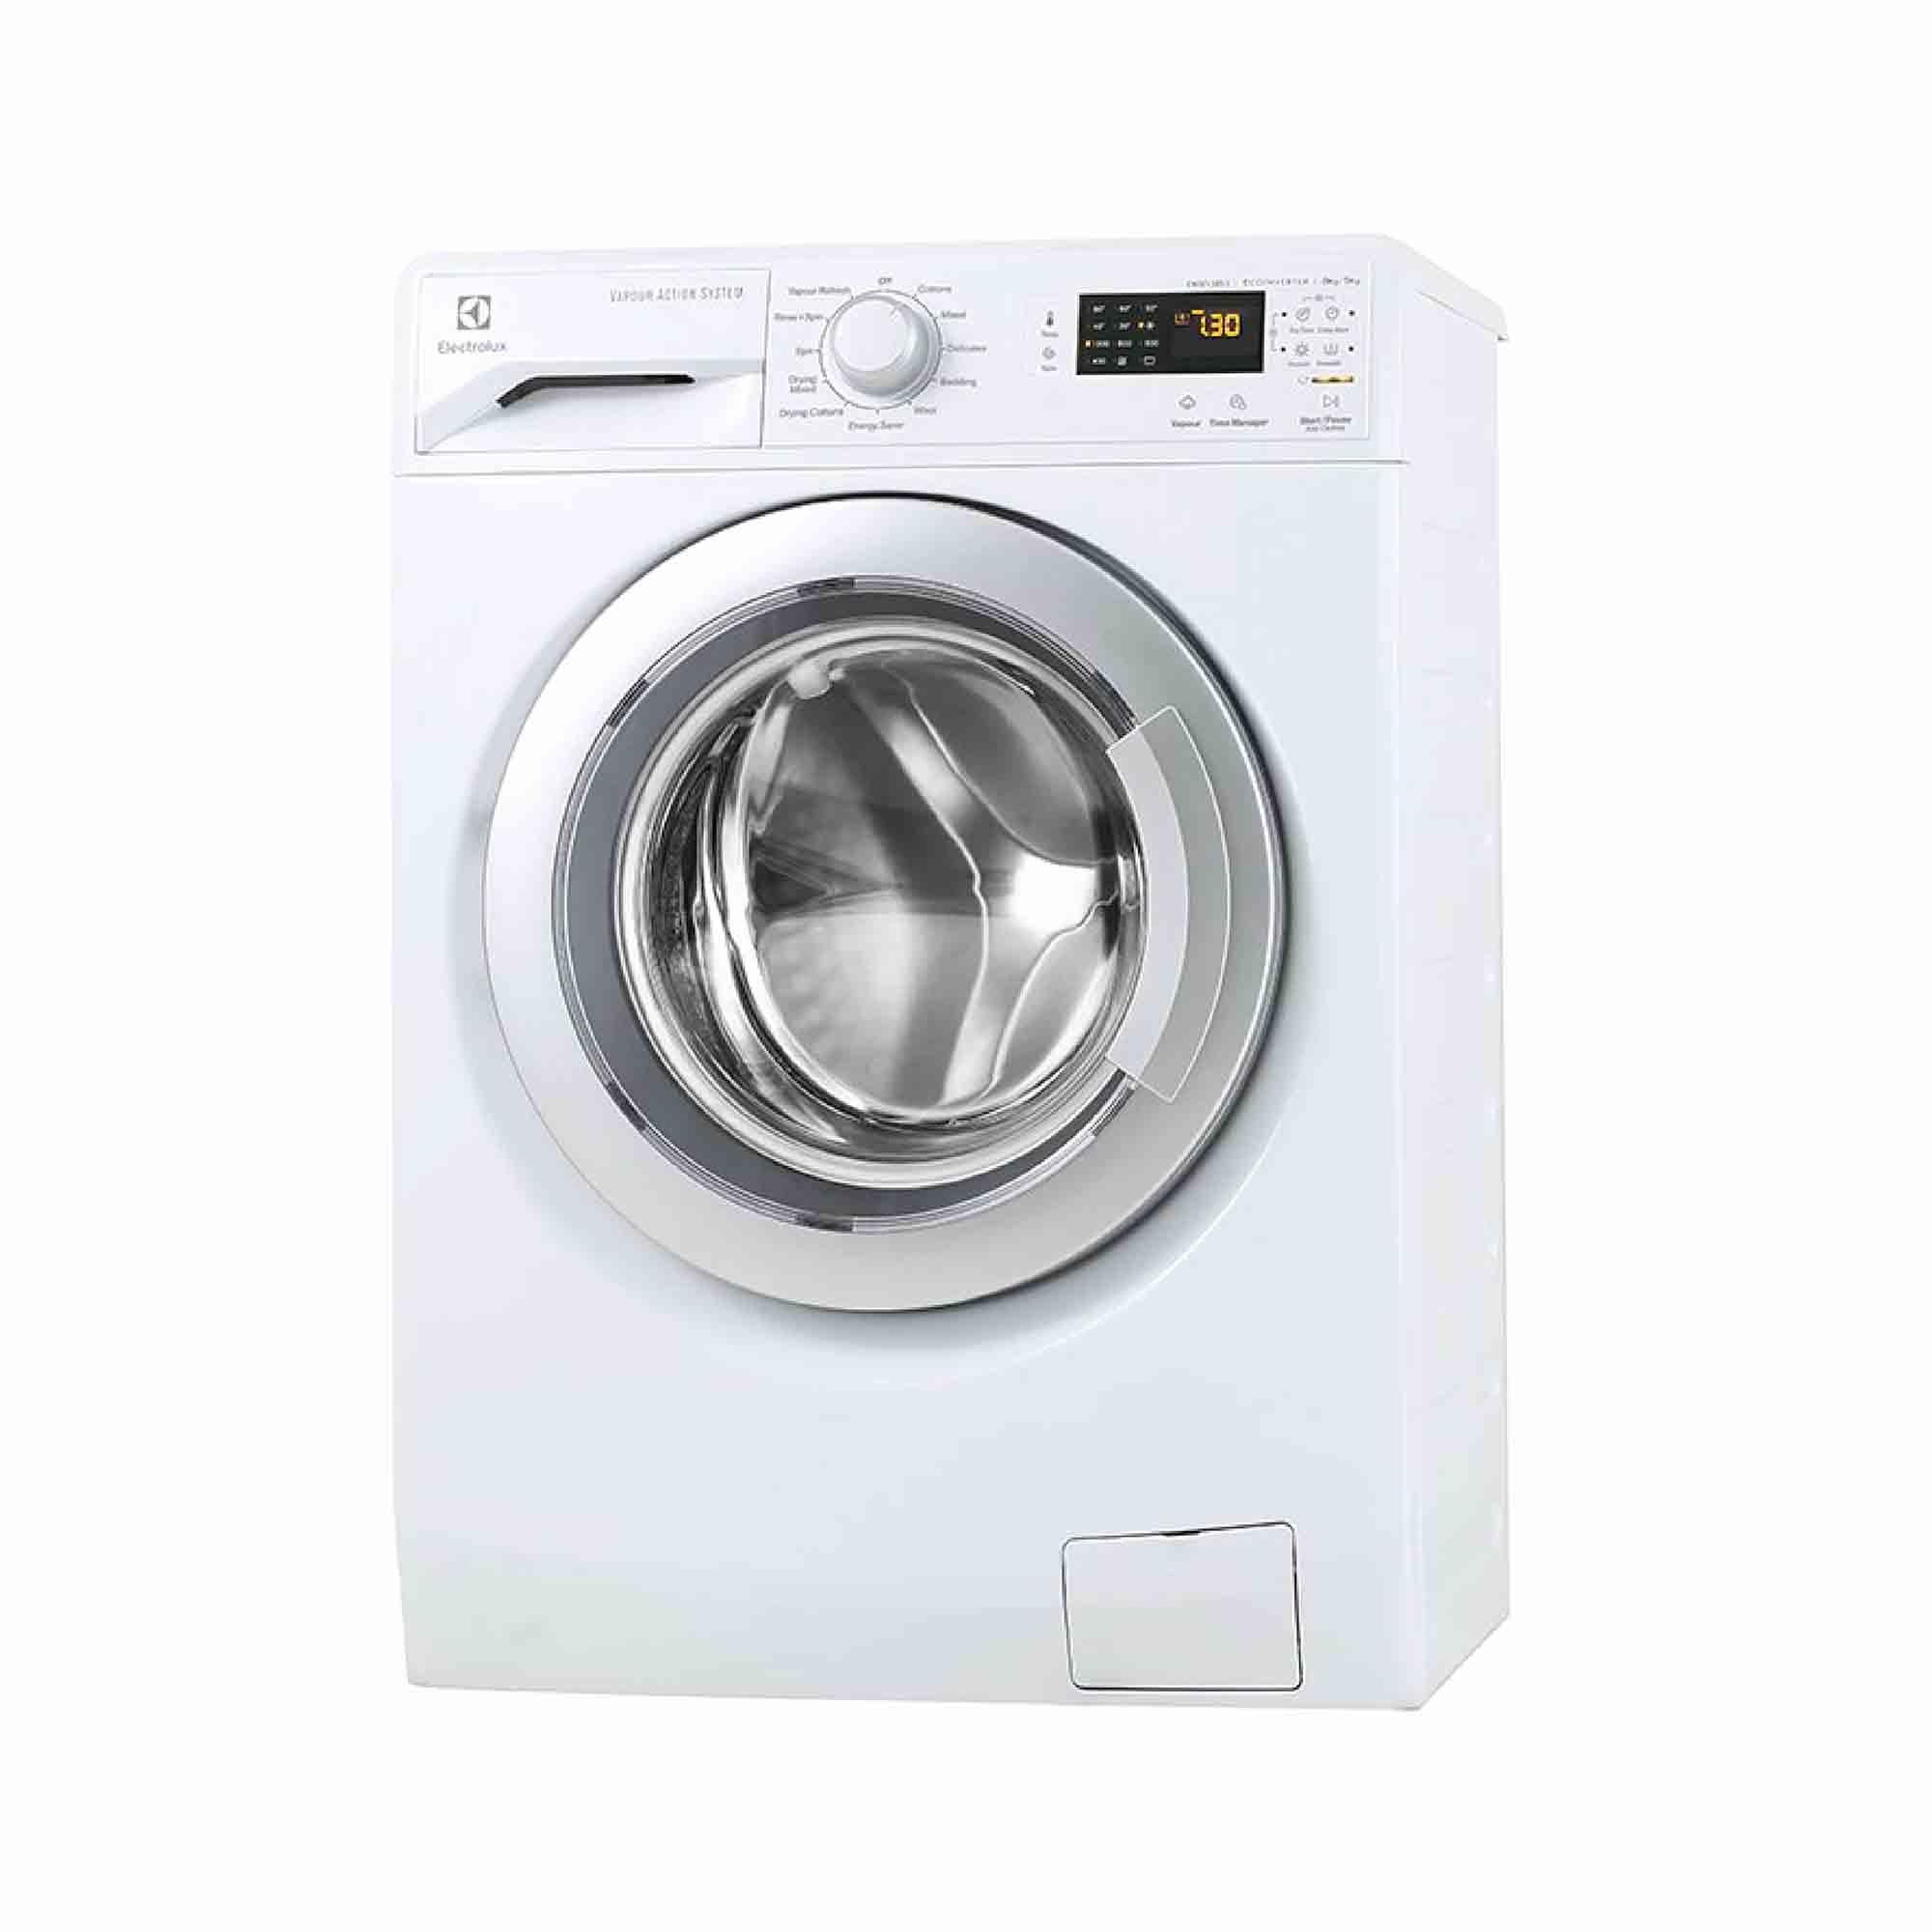 Electrolux Washer Dryer Eww12753 7 End 9 6 2020 446 Pm Washing Machine Wiring Diagram 5 Kg 2017 New Model